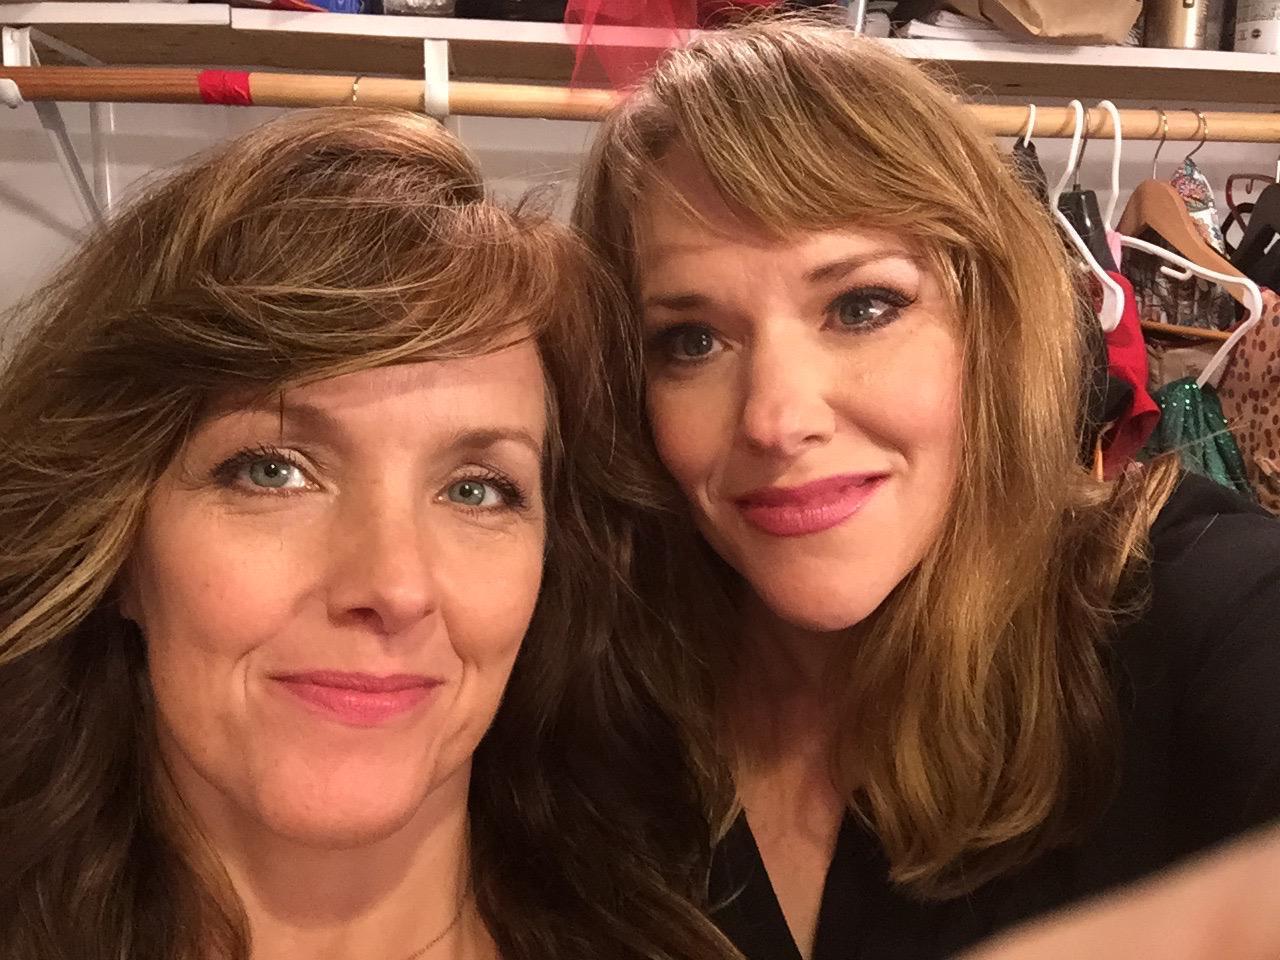 Queens!!!! https://t.co/SwGFEWQ54o Musical theater royalty!!! #AliceRipley #EmilySkinner #WCW #WomancrushWednesday http://t.co/npiHwxdJ4y